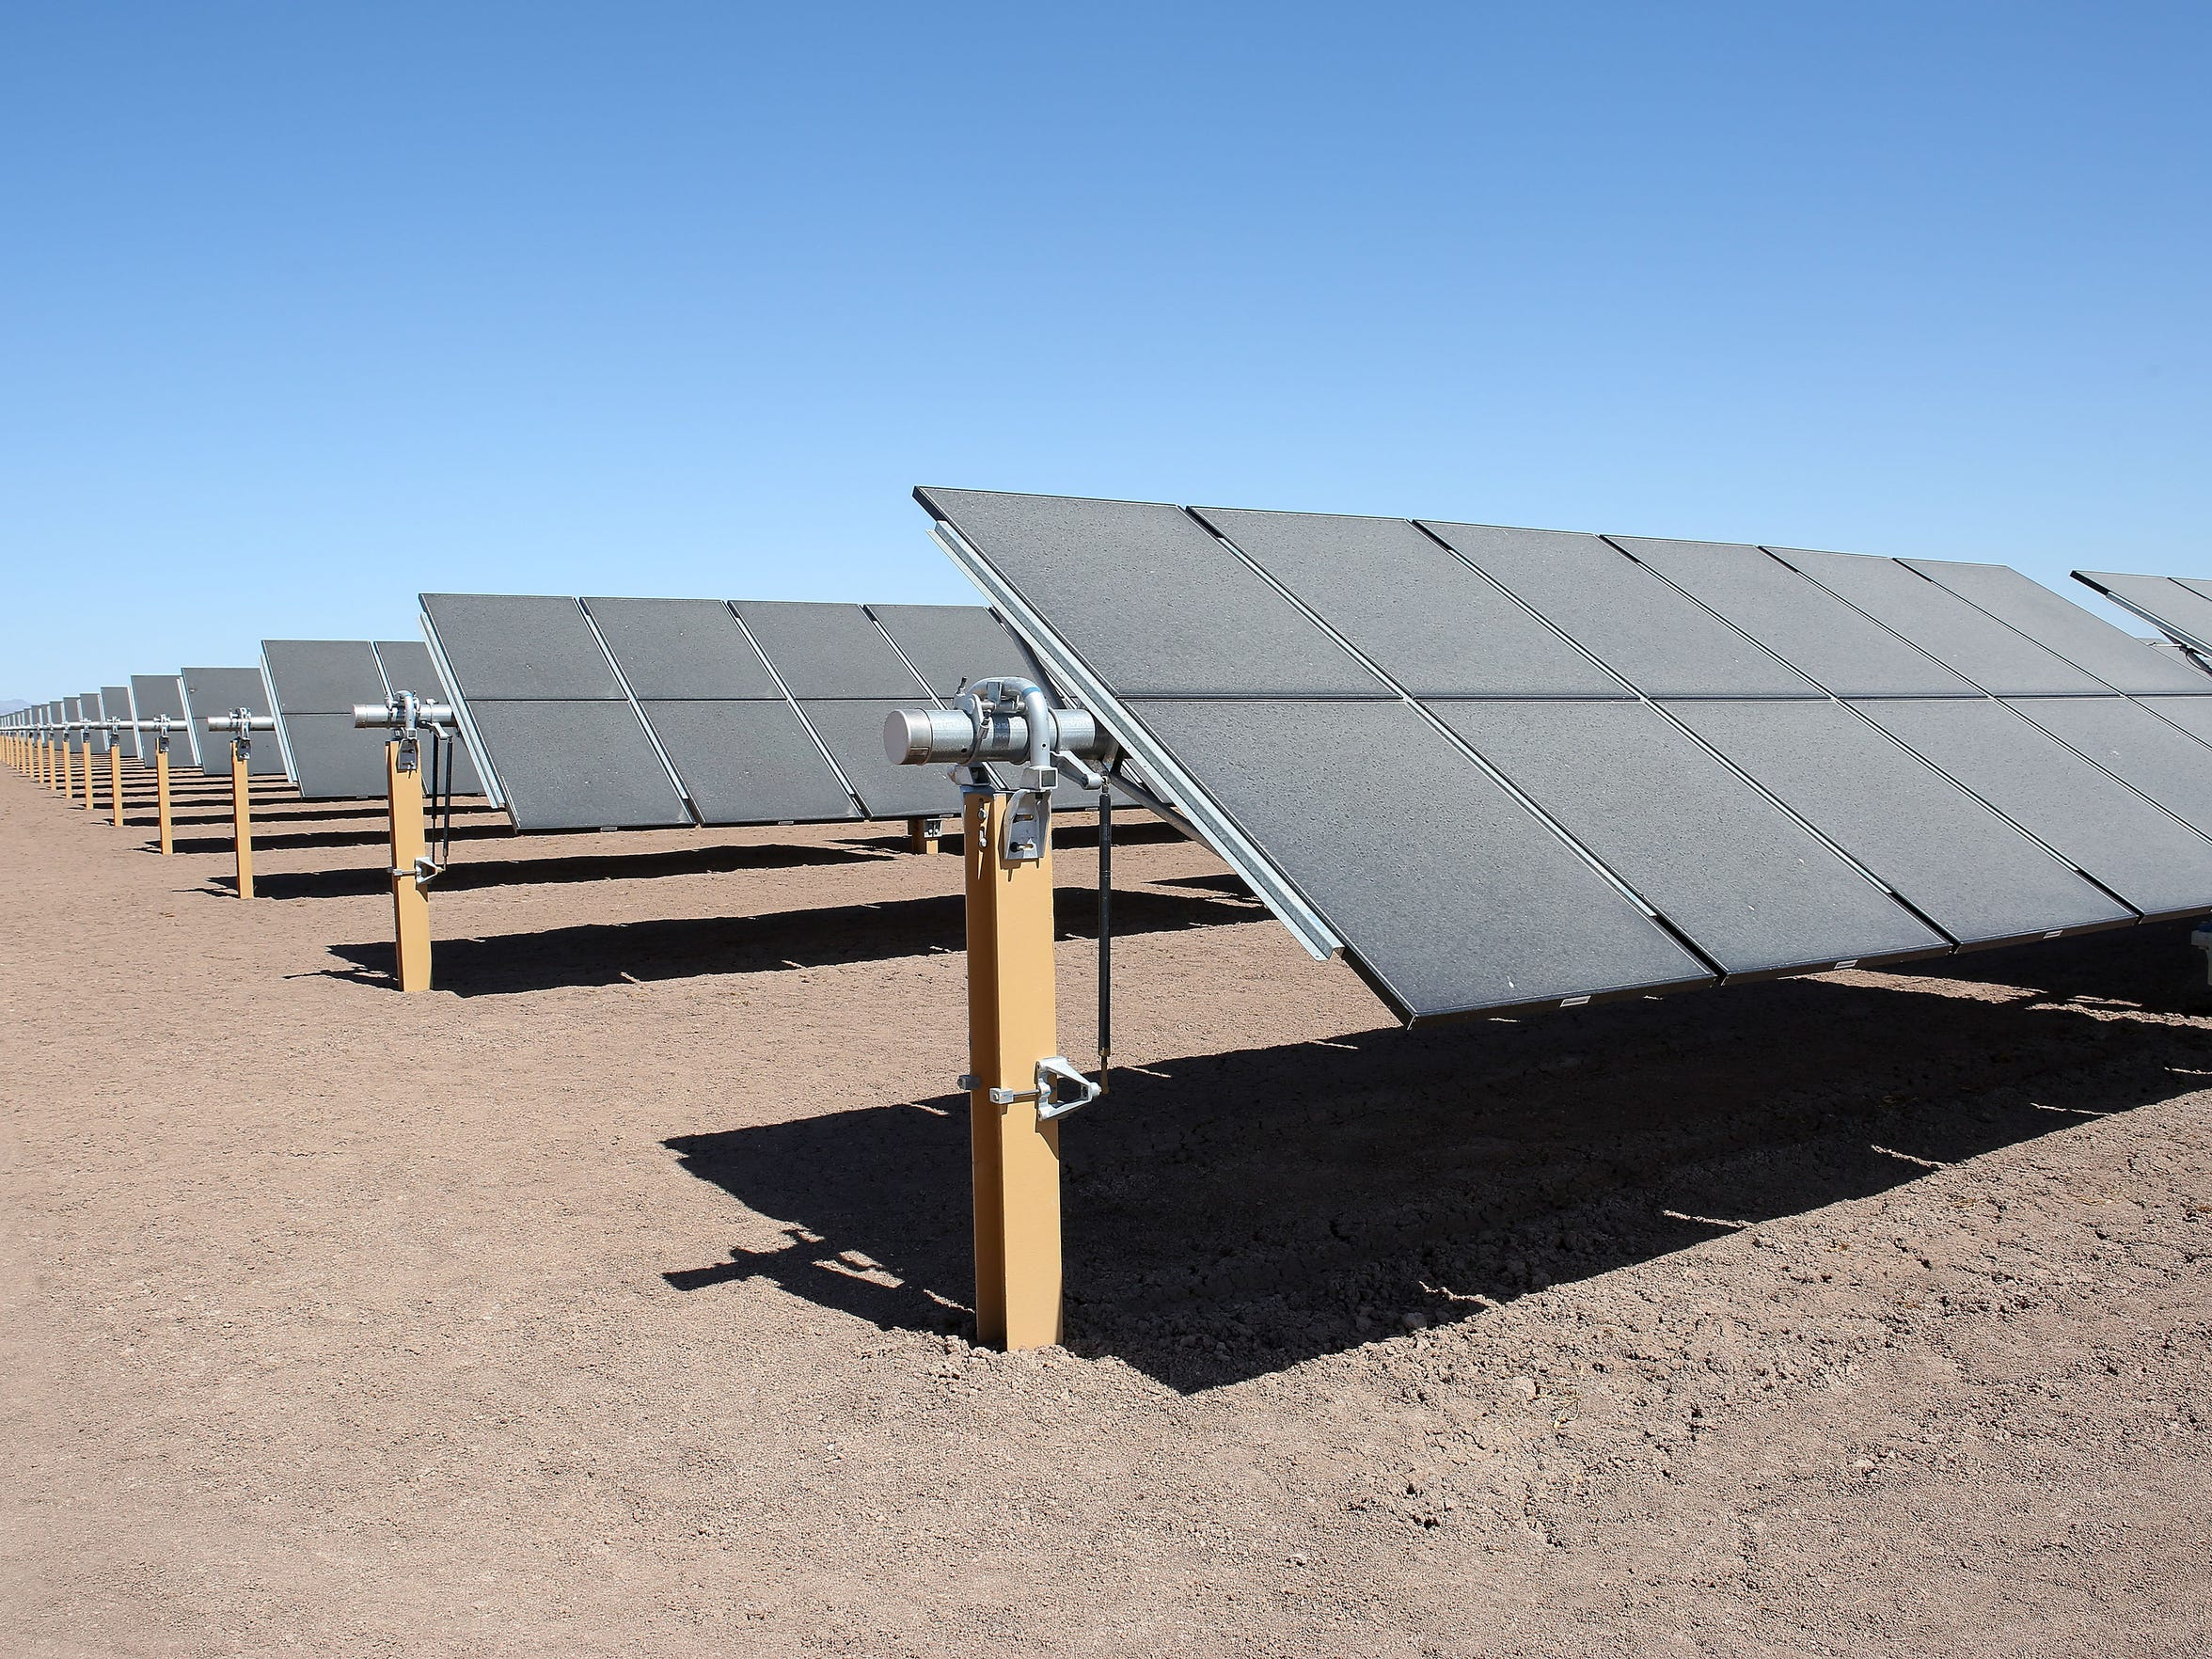 Solar panels generate electricity at the 107-megawatt